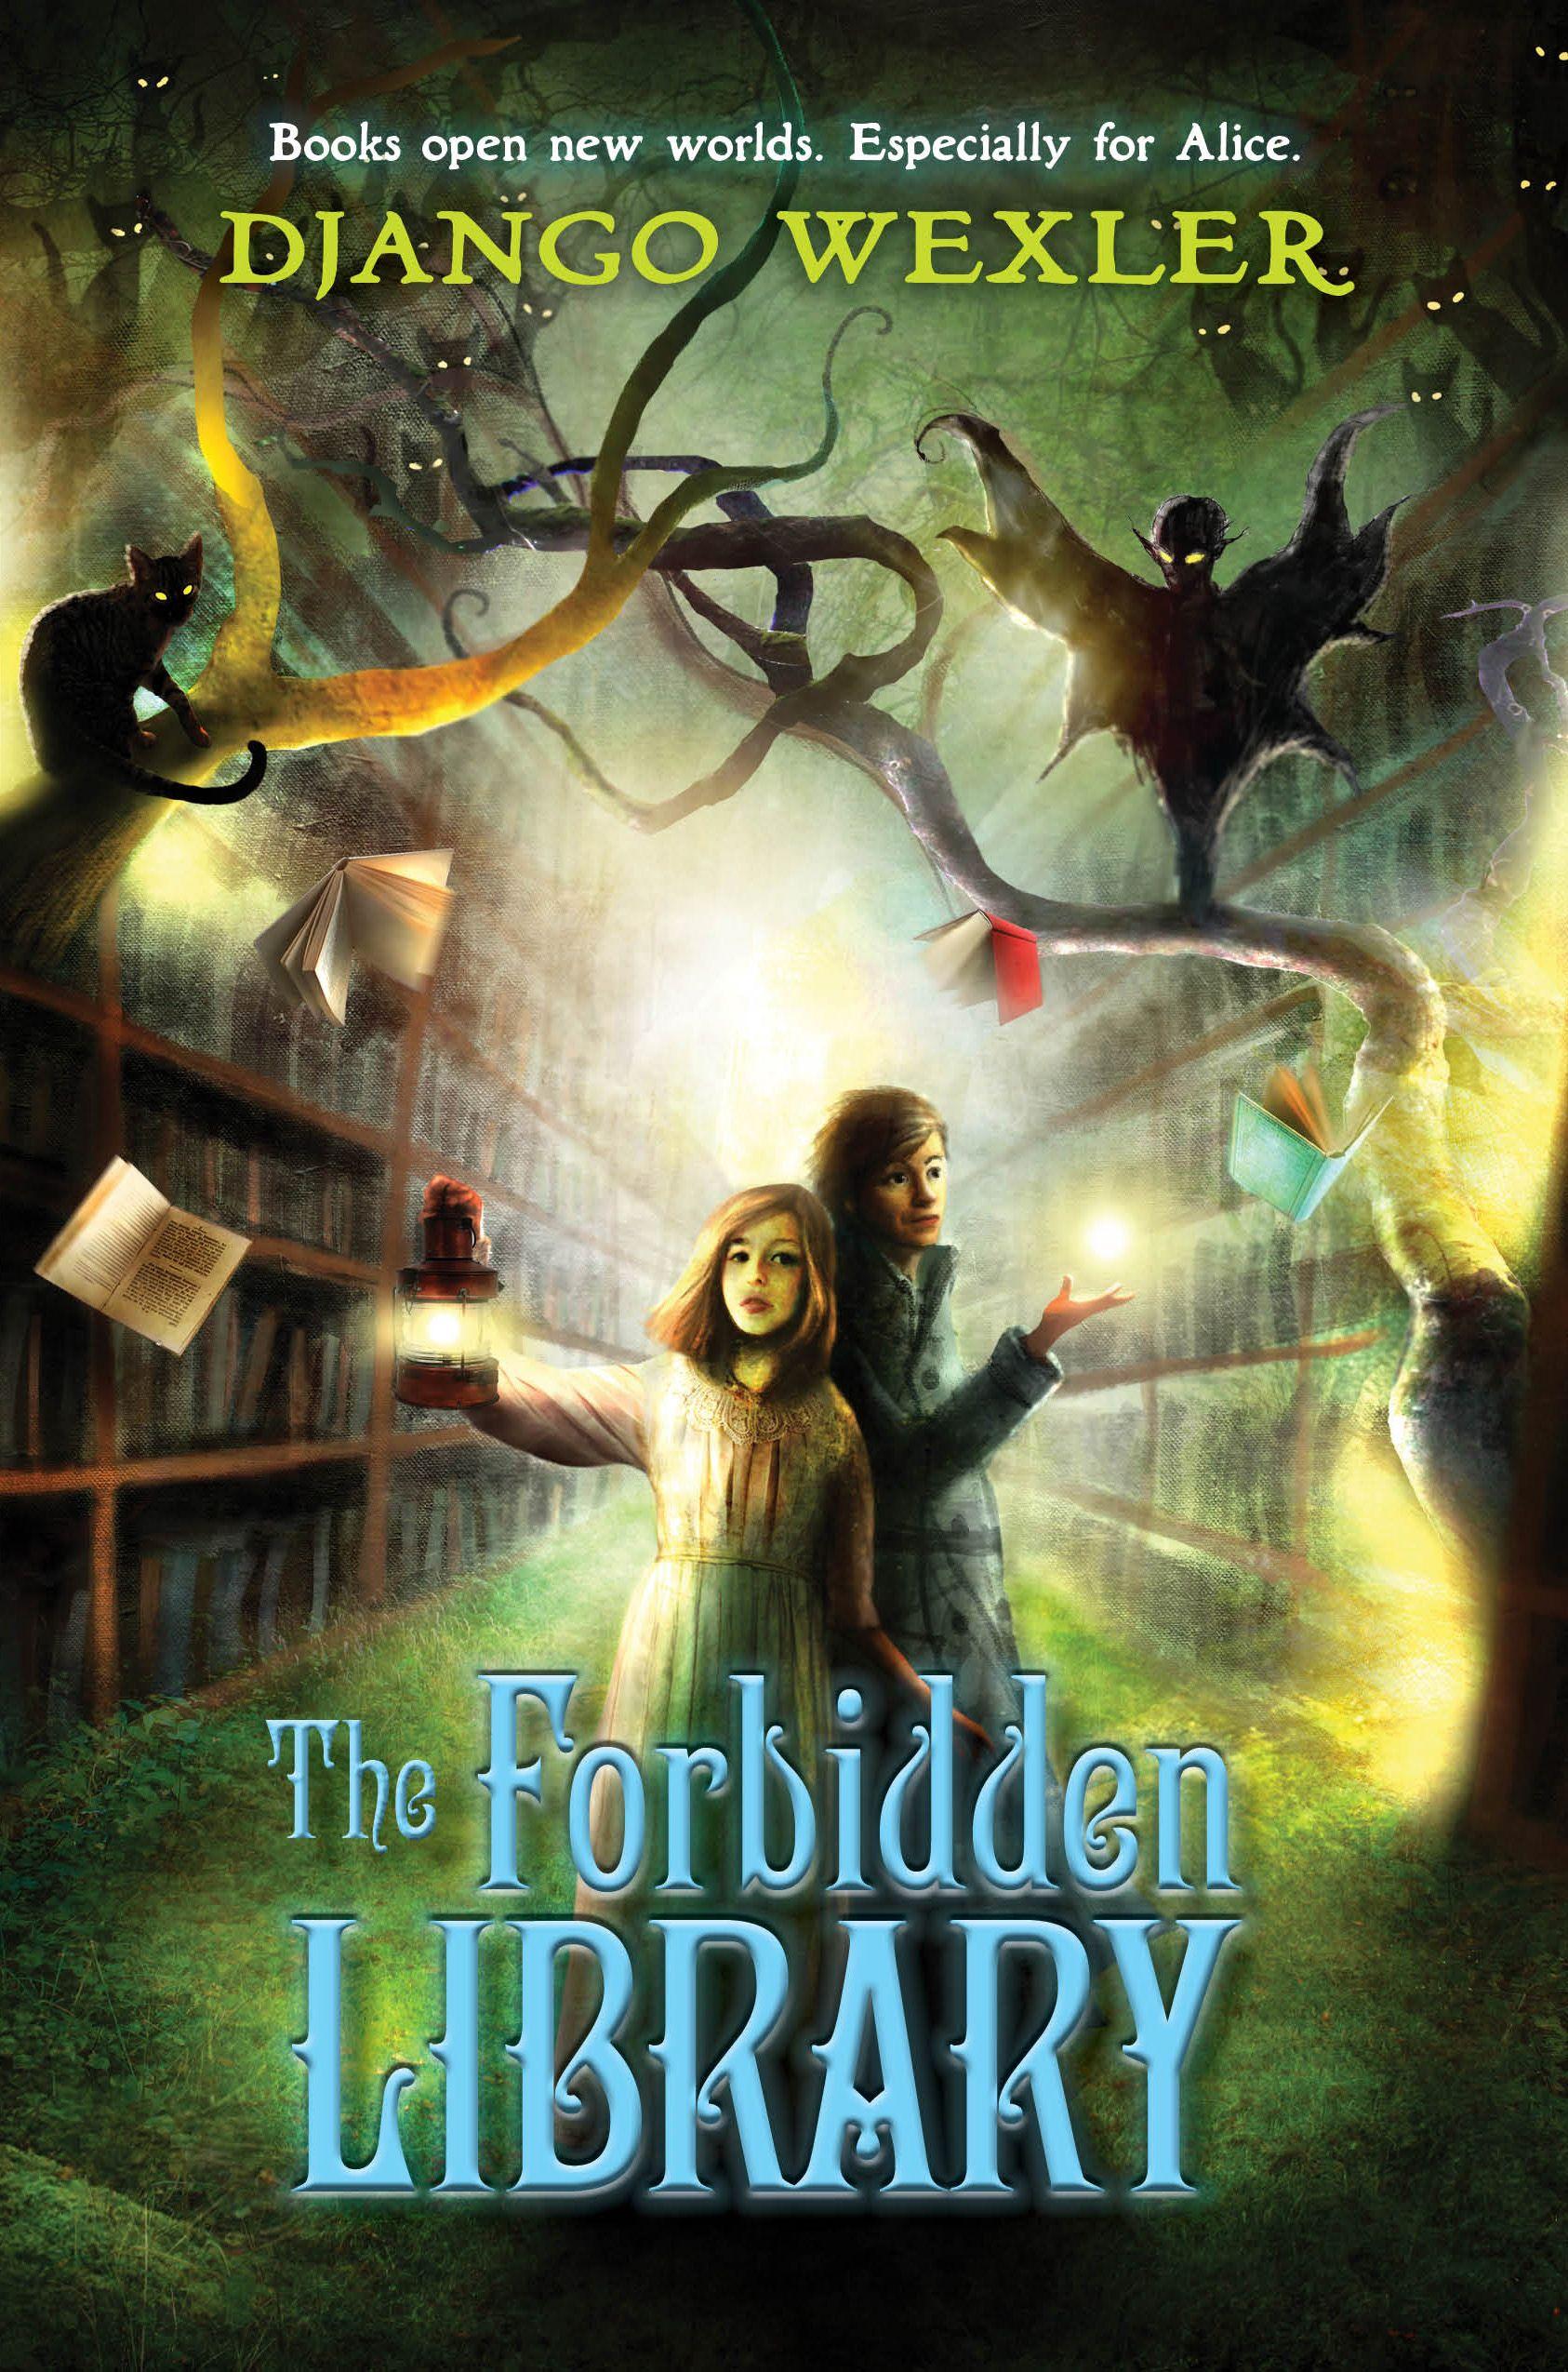 Nothing Forbidden